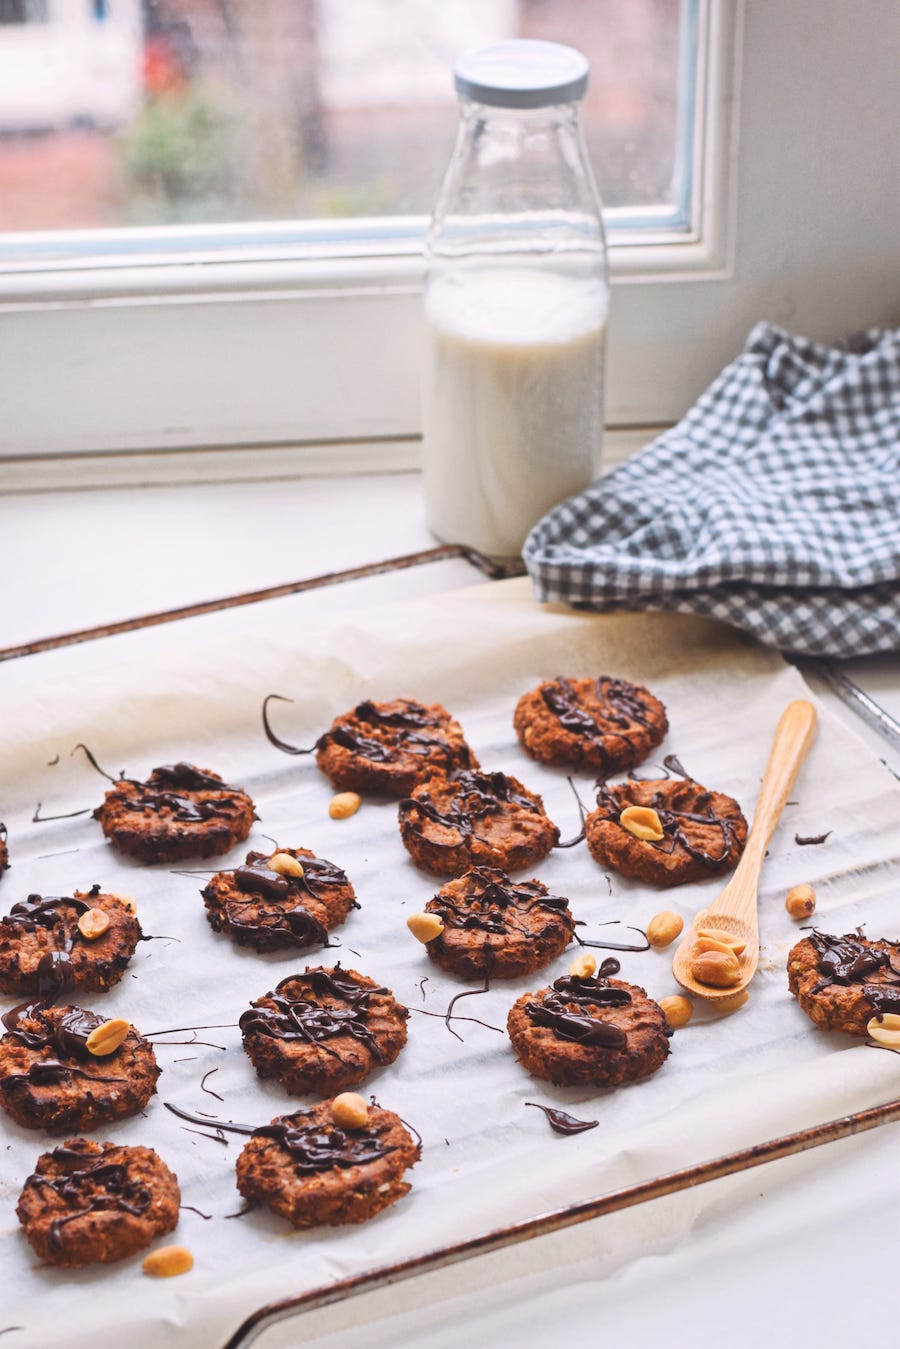 Makkelijke pindakaas koekjes recept | Healthy Wanderlust